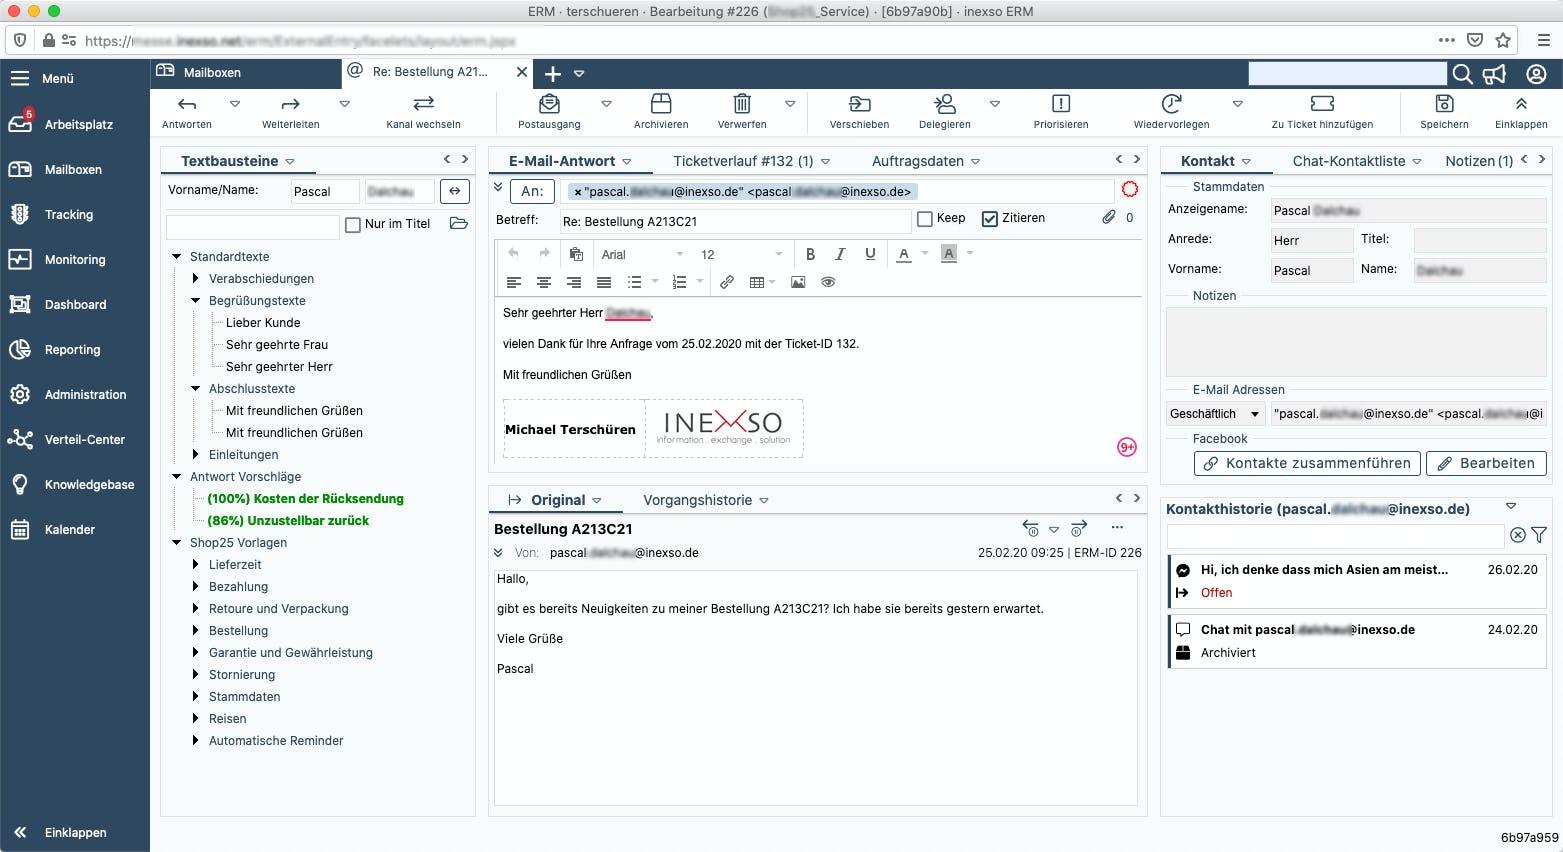 INEXSO ERM Logiciel - 1